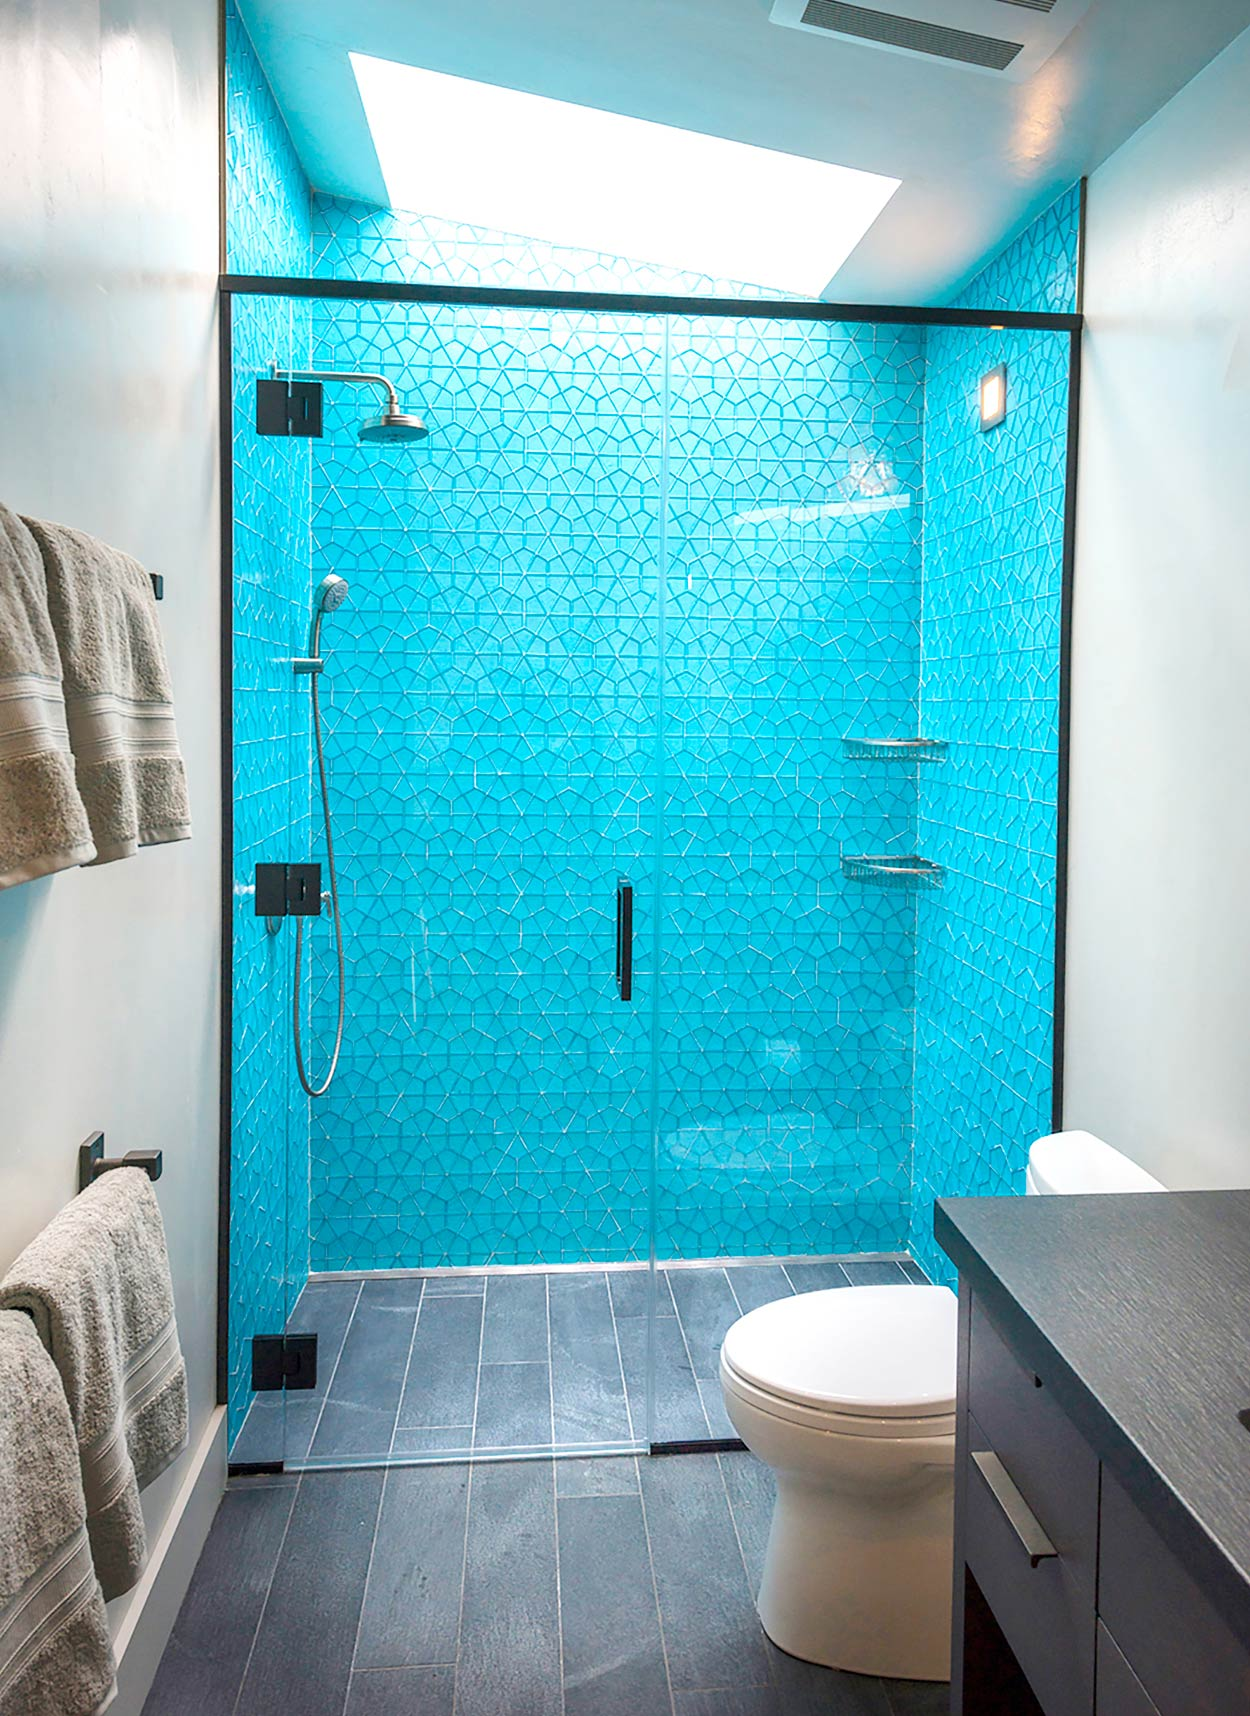 Tile Work - Cape Associates, Inc